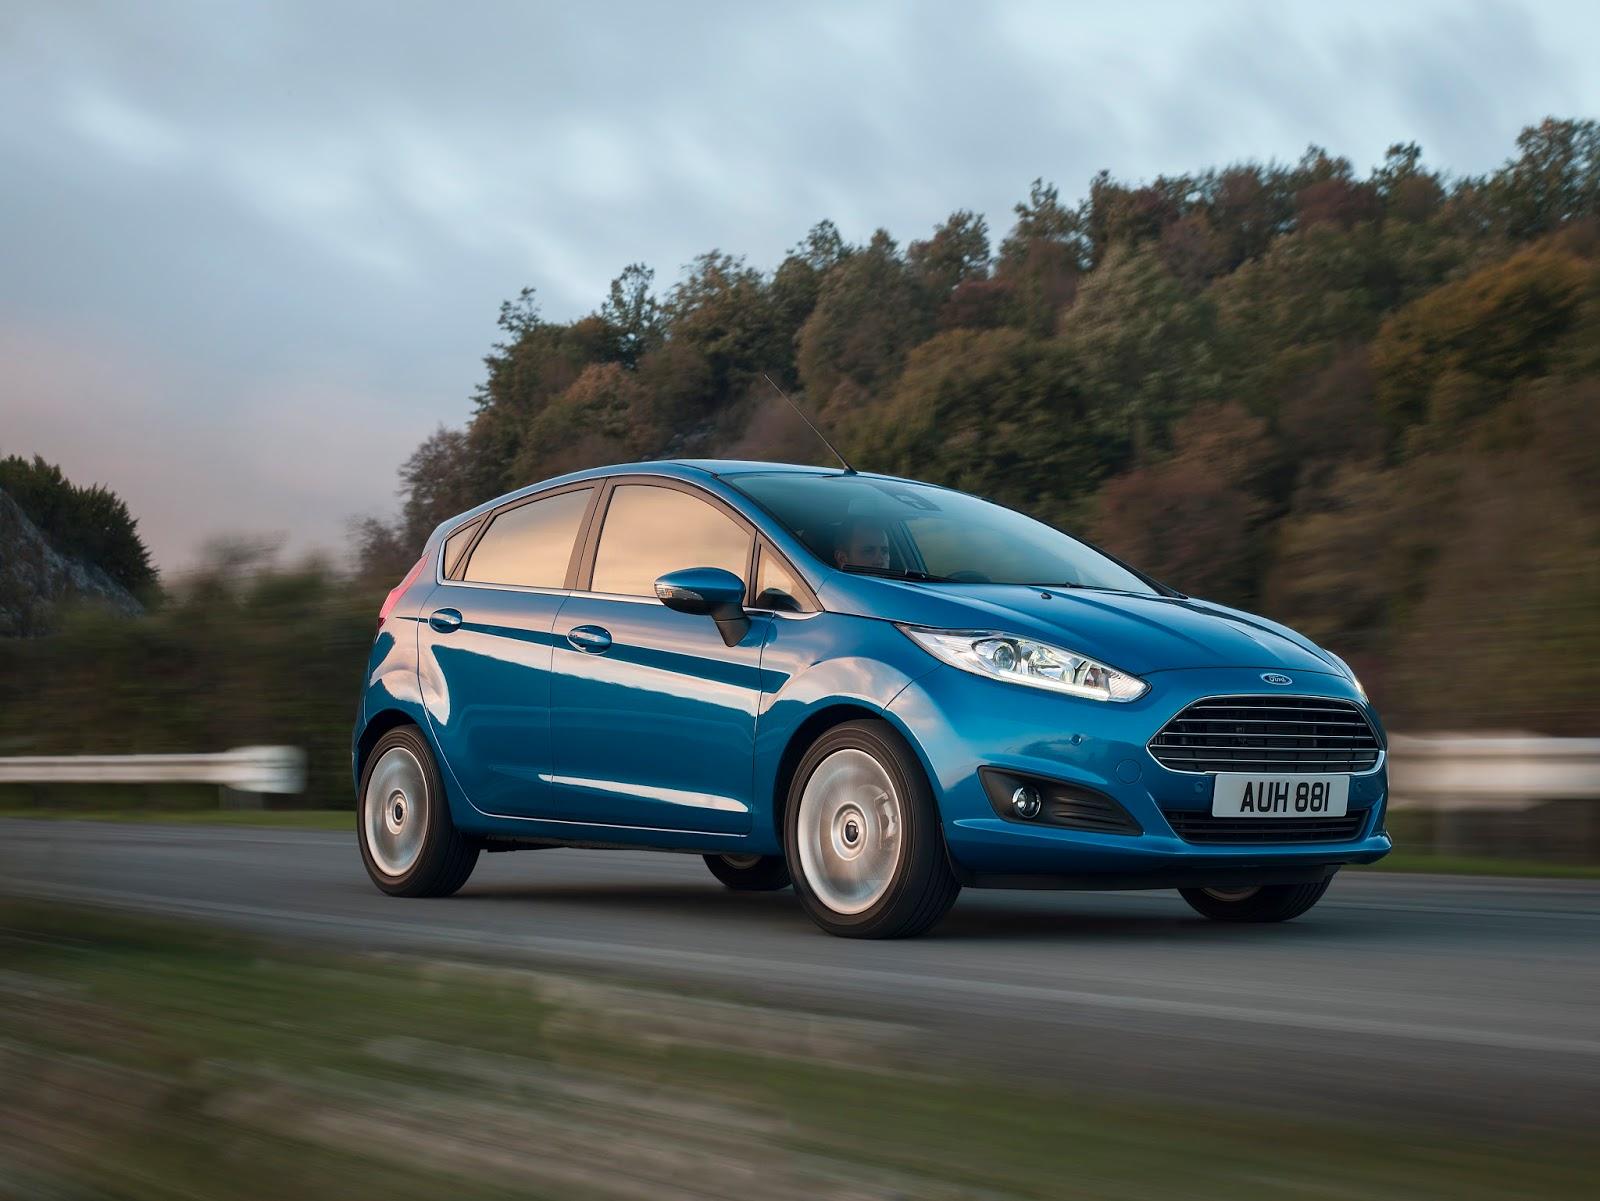 2012FordFiesta Έρχεται το νέο Ford Fiesta, όμως το παλιό πουλάει σαν τρελό Bestseller, Ford, Ford Fiesta, Sales, videos, Εργοστάσιο, πωλήσεις, πωλήσεις αυτοκινήτων